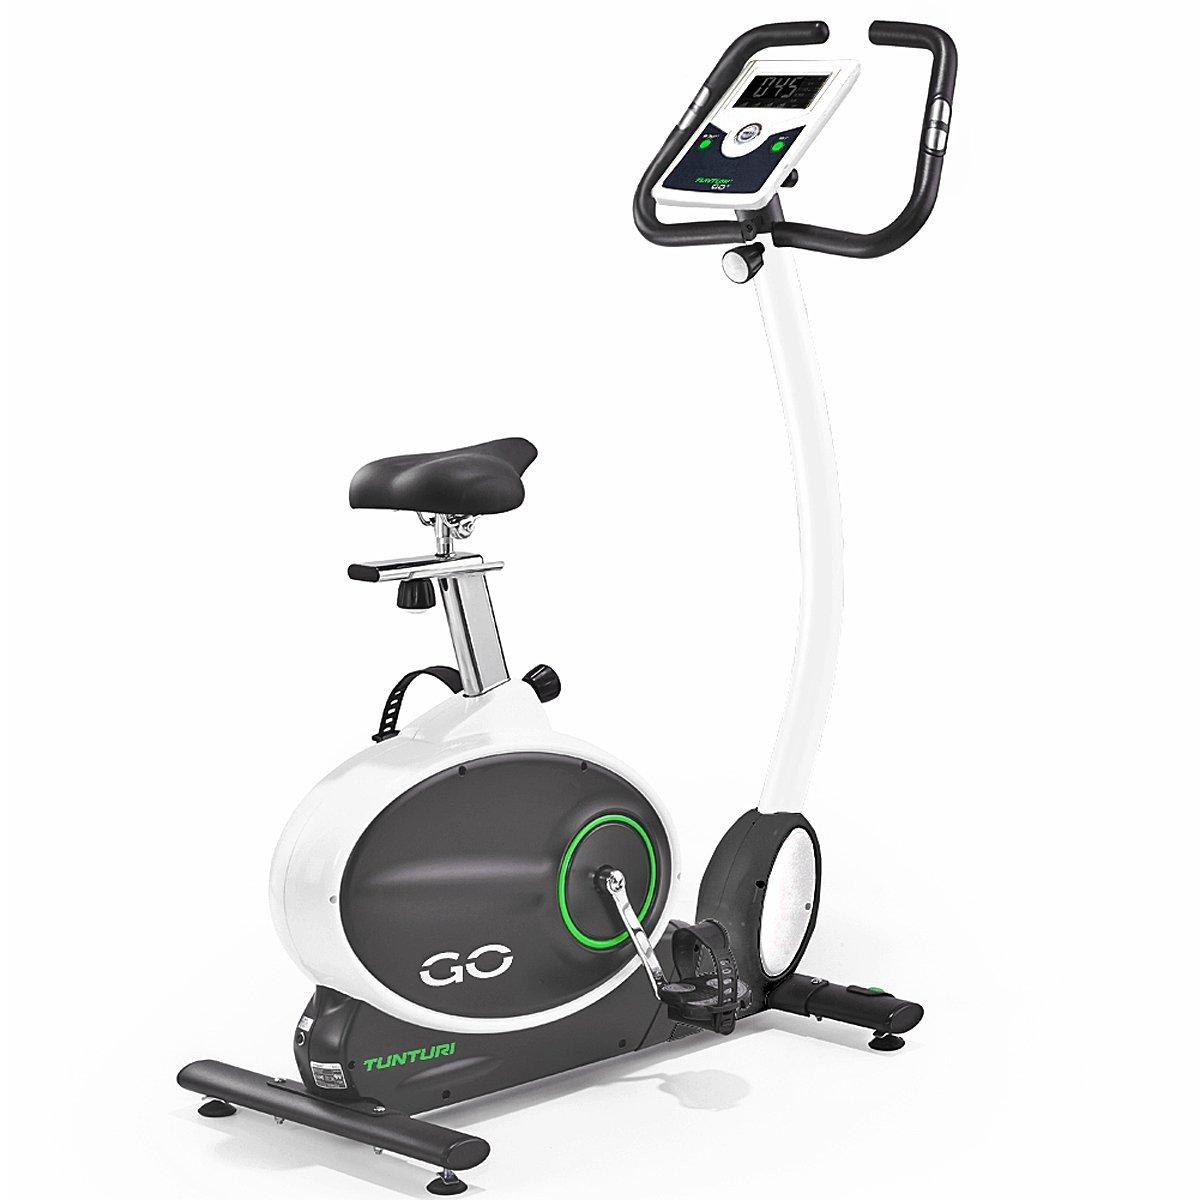 Tunturi GO Bike 30 Upright Exercise Bike